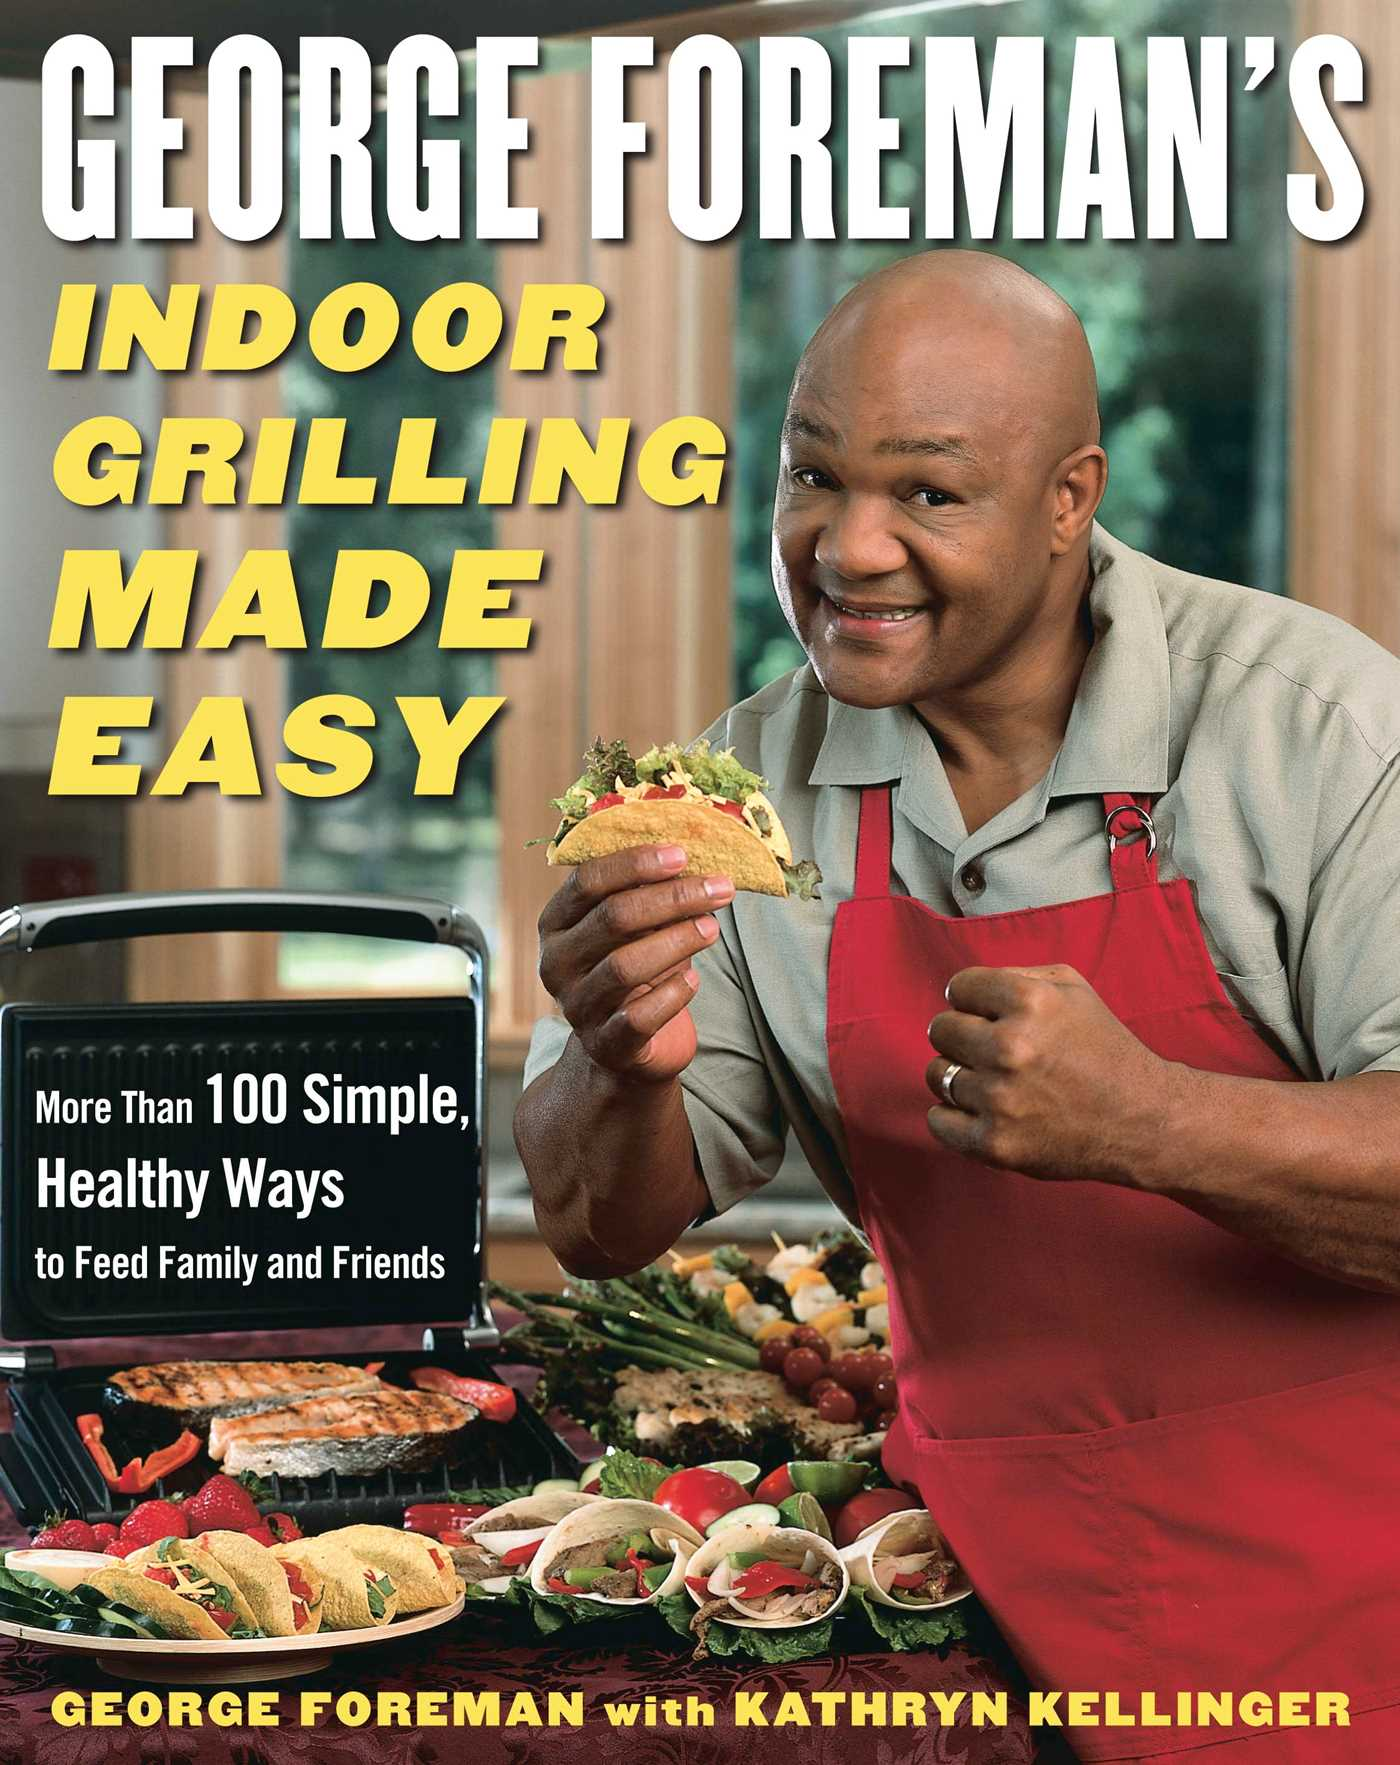 George foremans indoor grilling made easy 9781439103470 hr